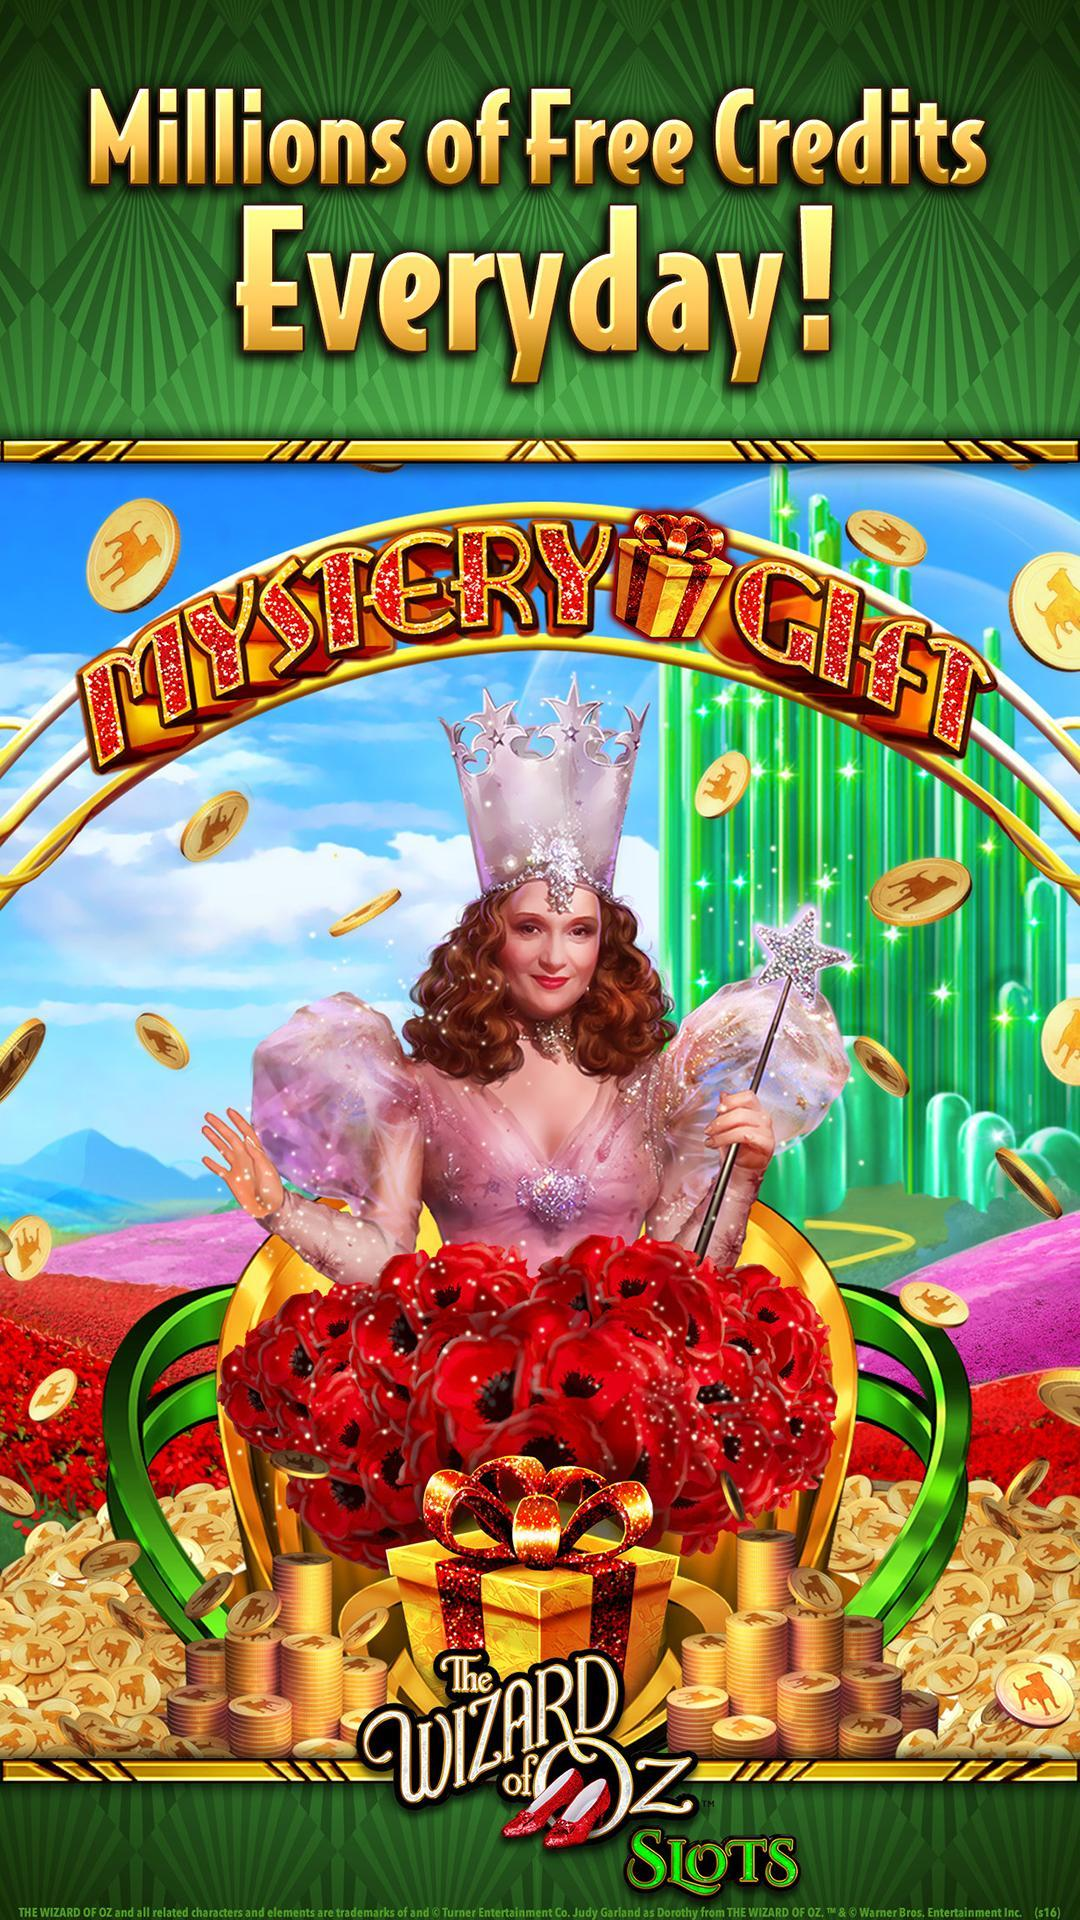 Wizard of Oz Free Slots Casino 134.0.2045 Screenshot 4